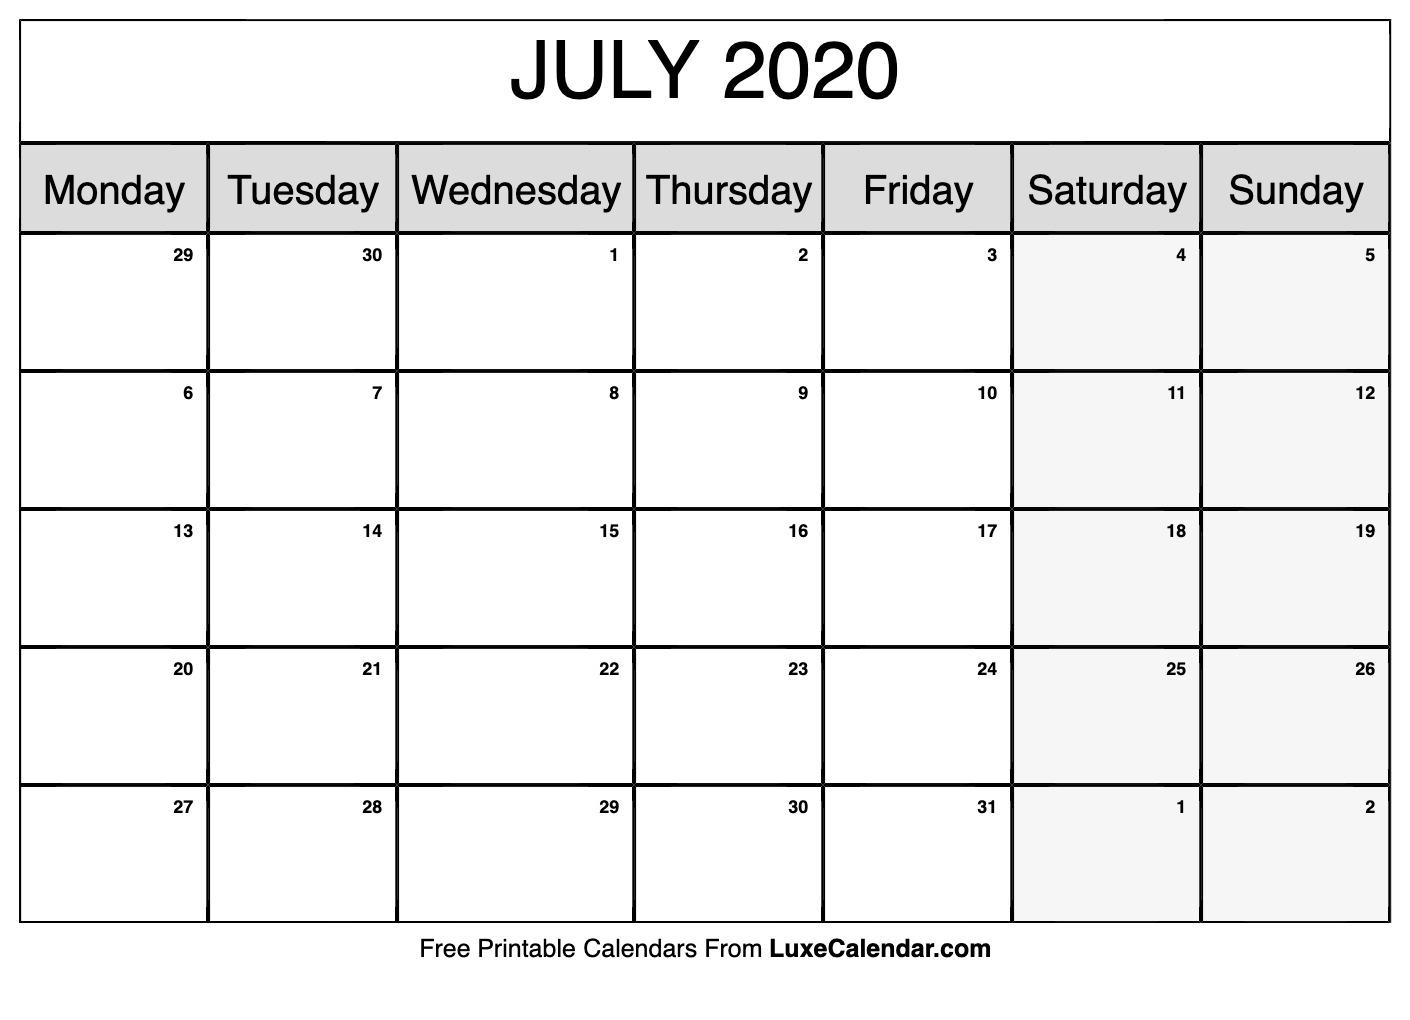 Blank July 2020 Calendar Printable - Luxe Calendar